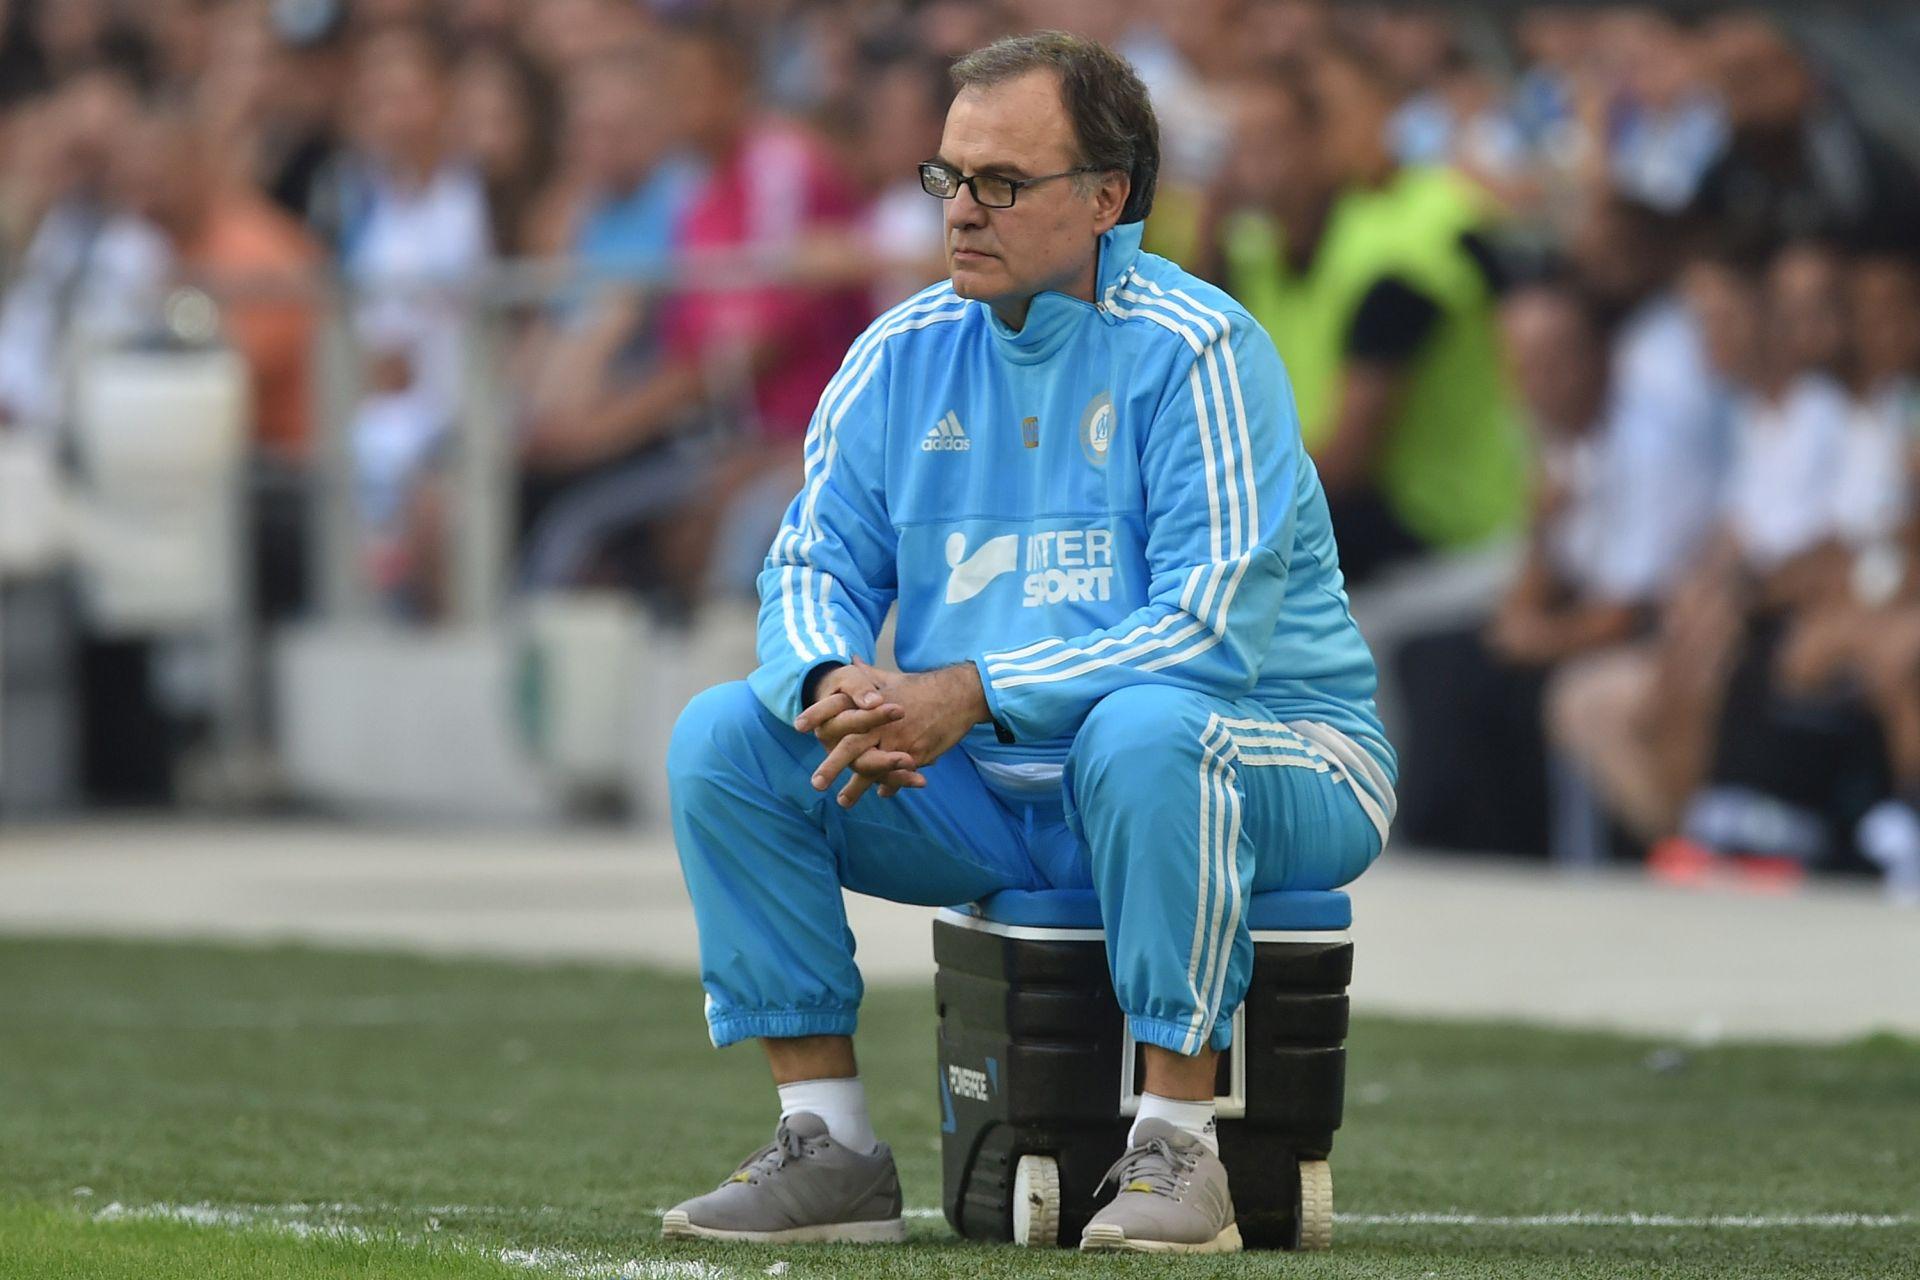 Pomoćni trener Passi na klupi Olympiquea iz Marseilla